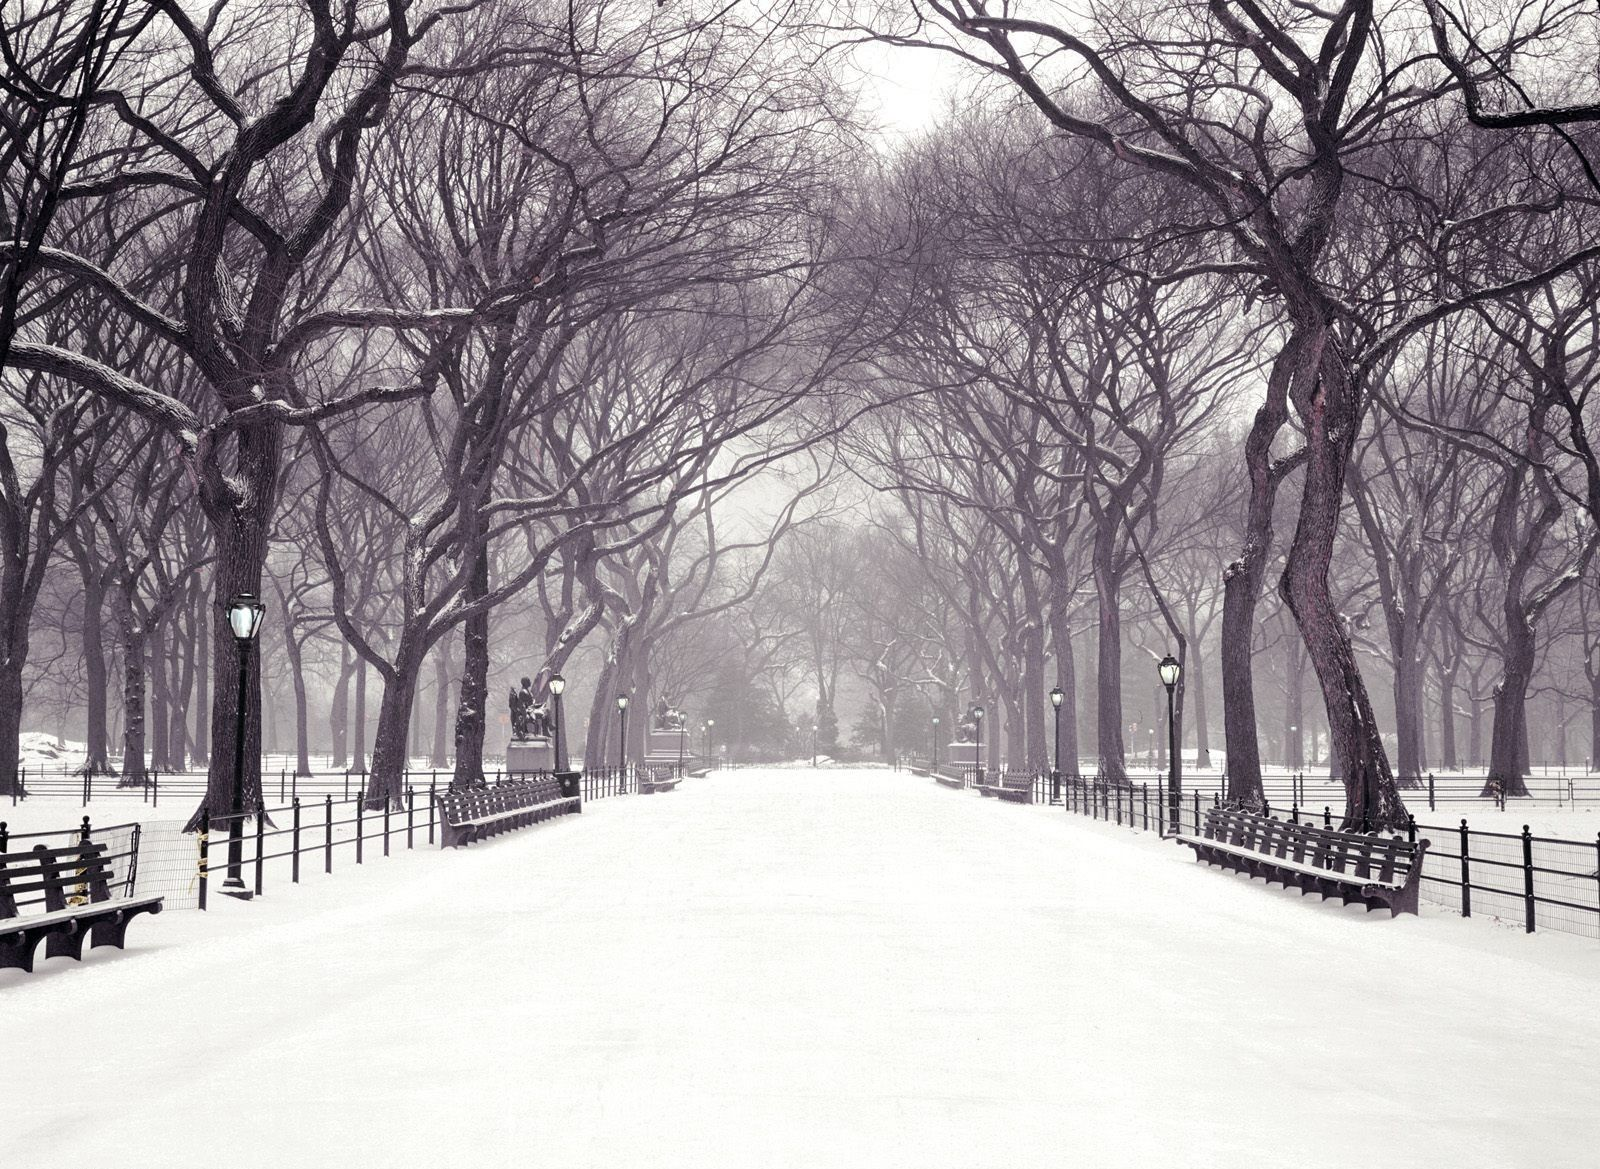 Central Park Memorial New york christmas Winter wallpaper 1600x1169